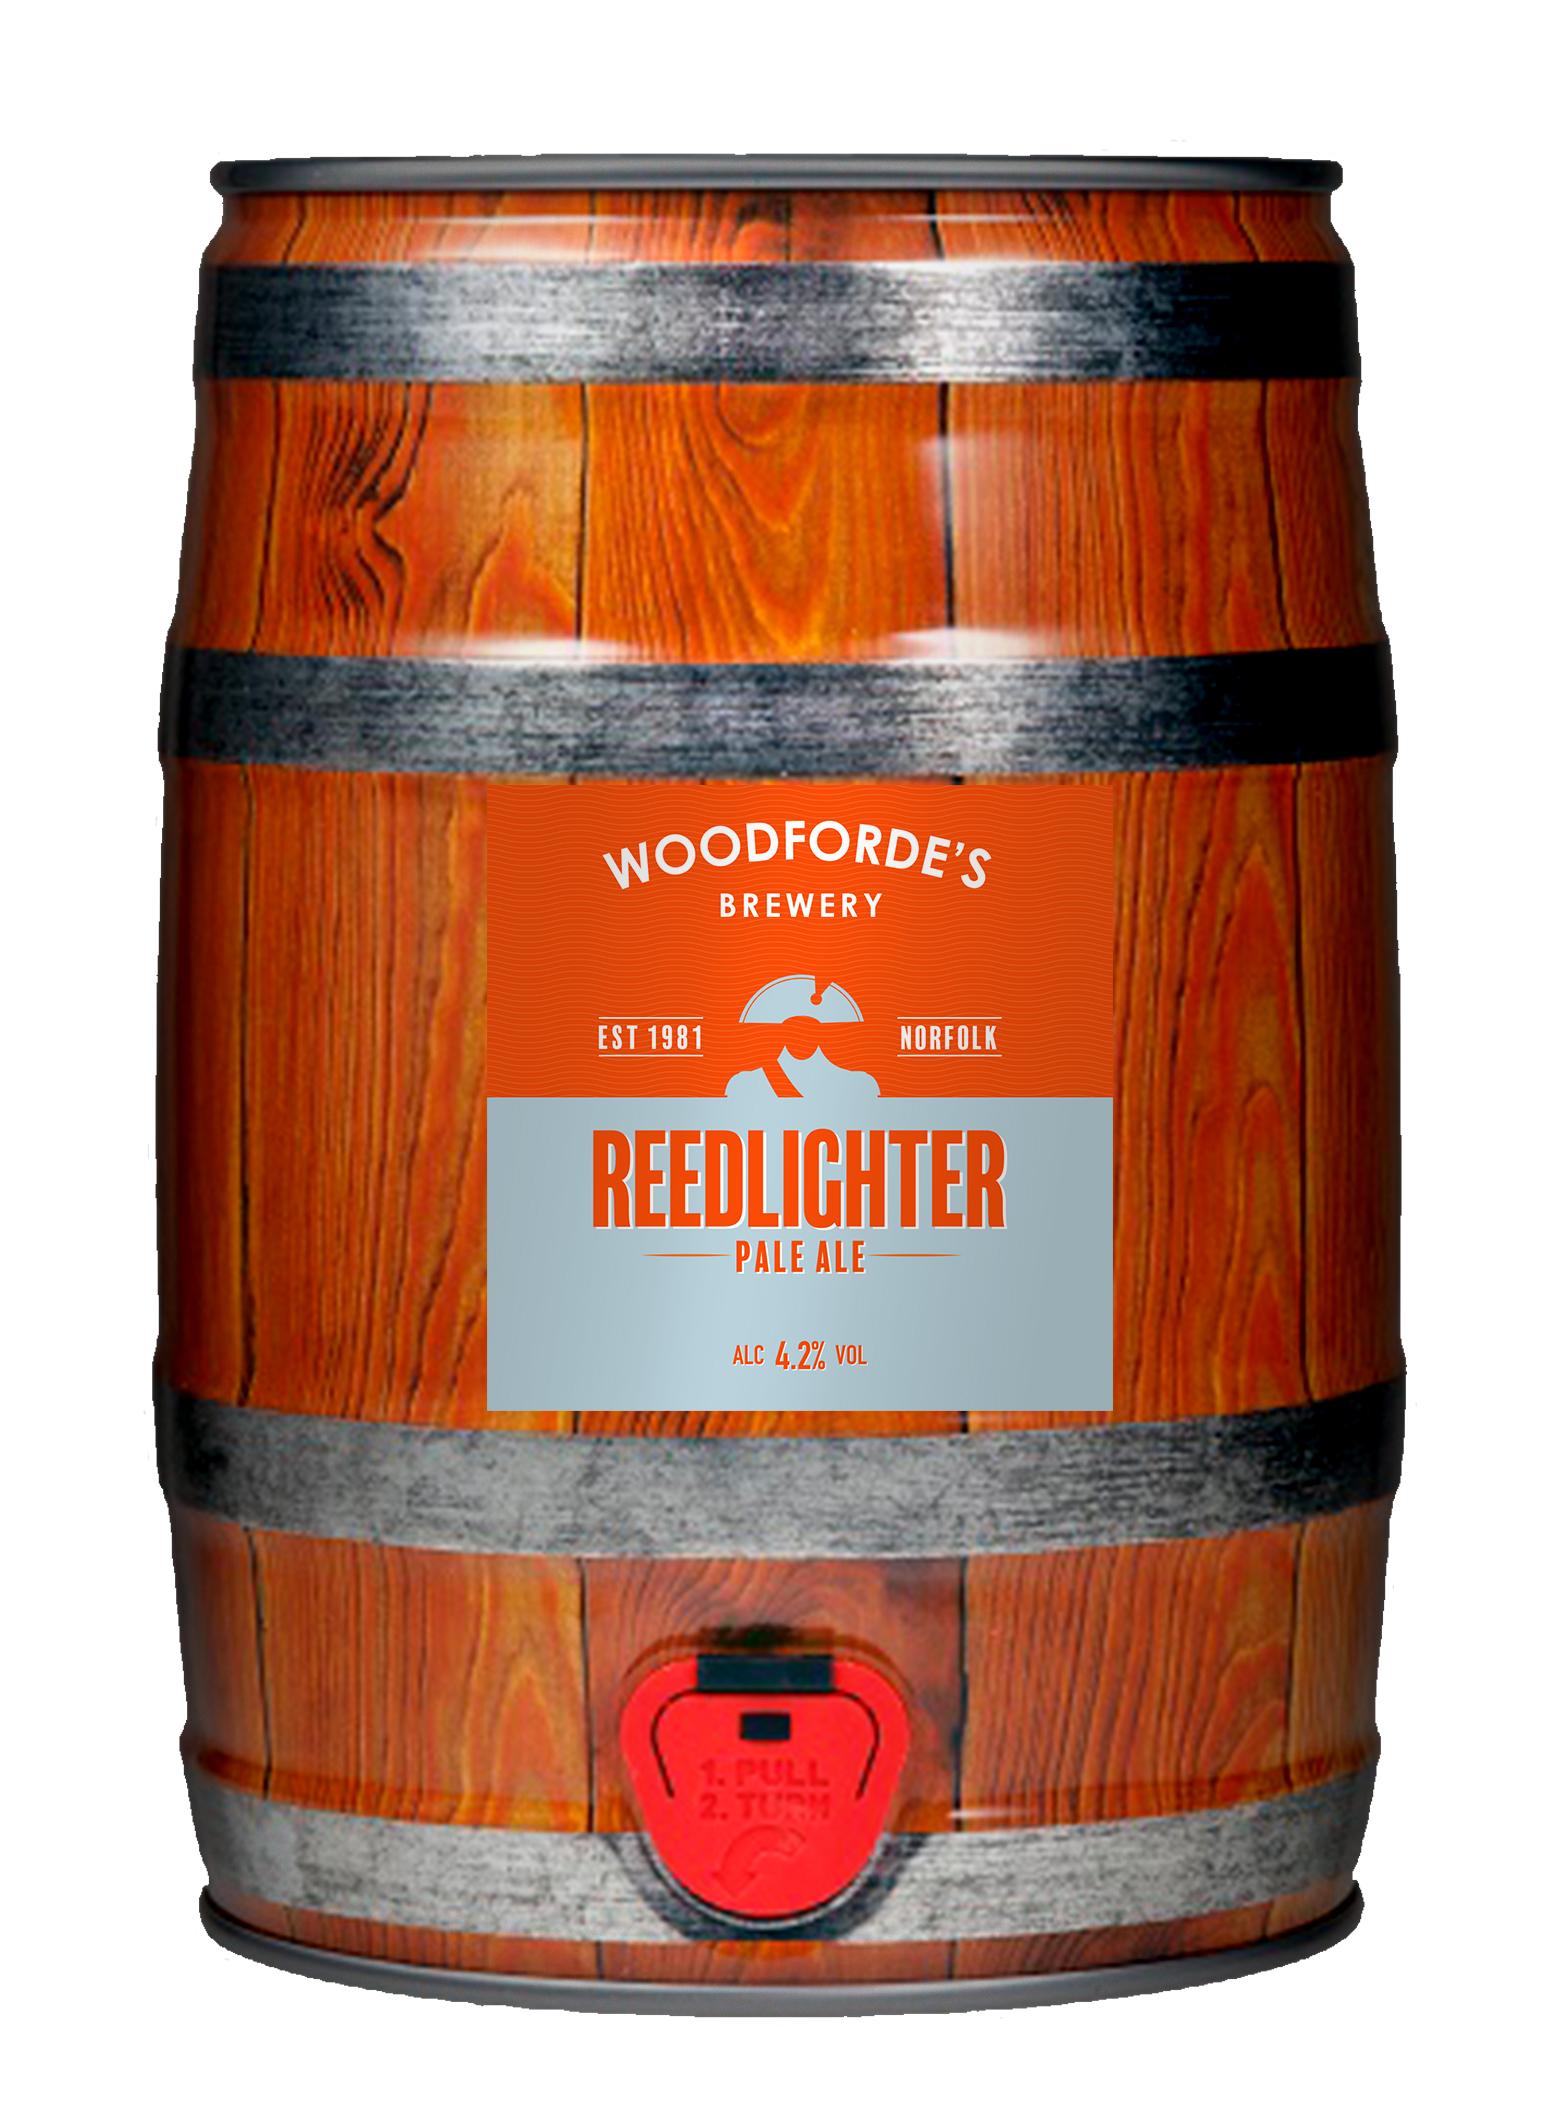 Woodforde's Brewery, Redlighter Pale Ale Mini Cask, ú17.99 at www.woodfordes.co.uk copy